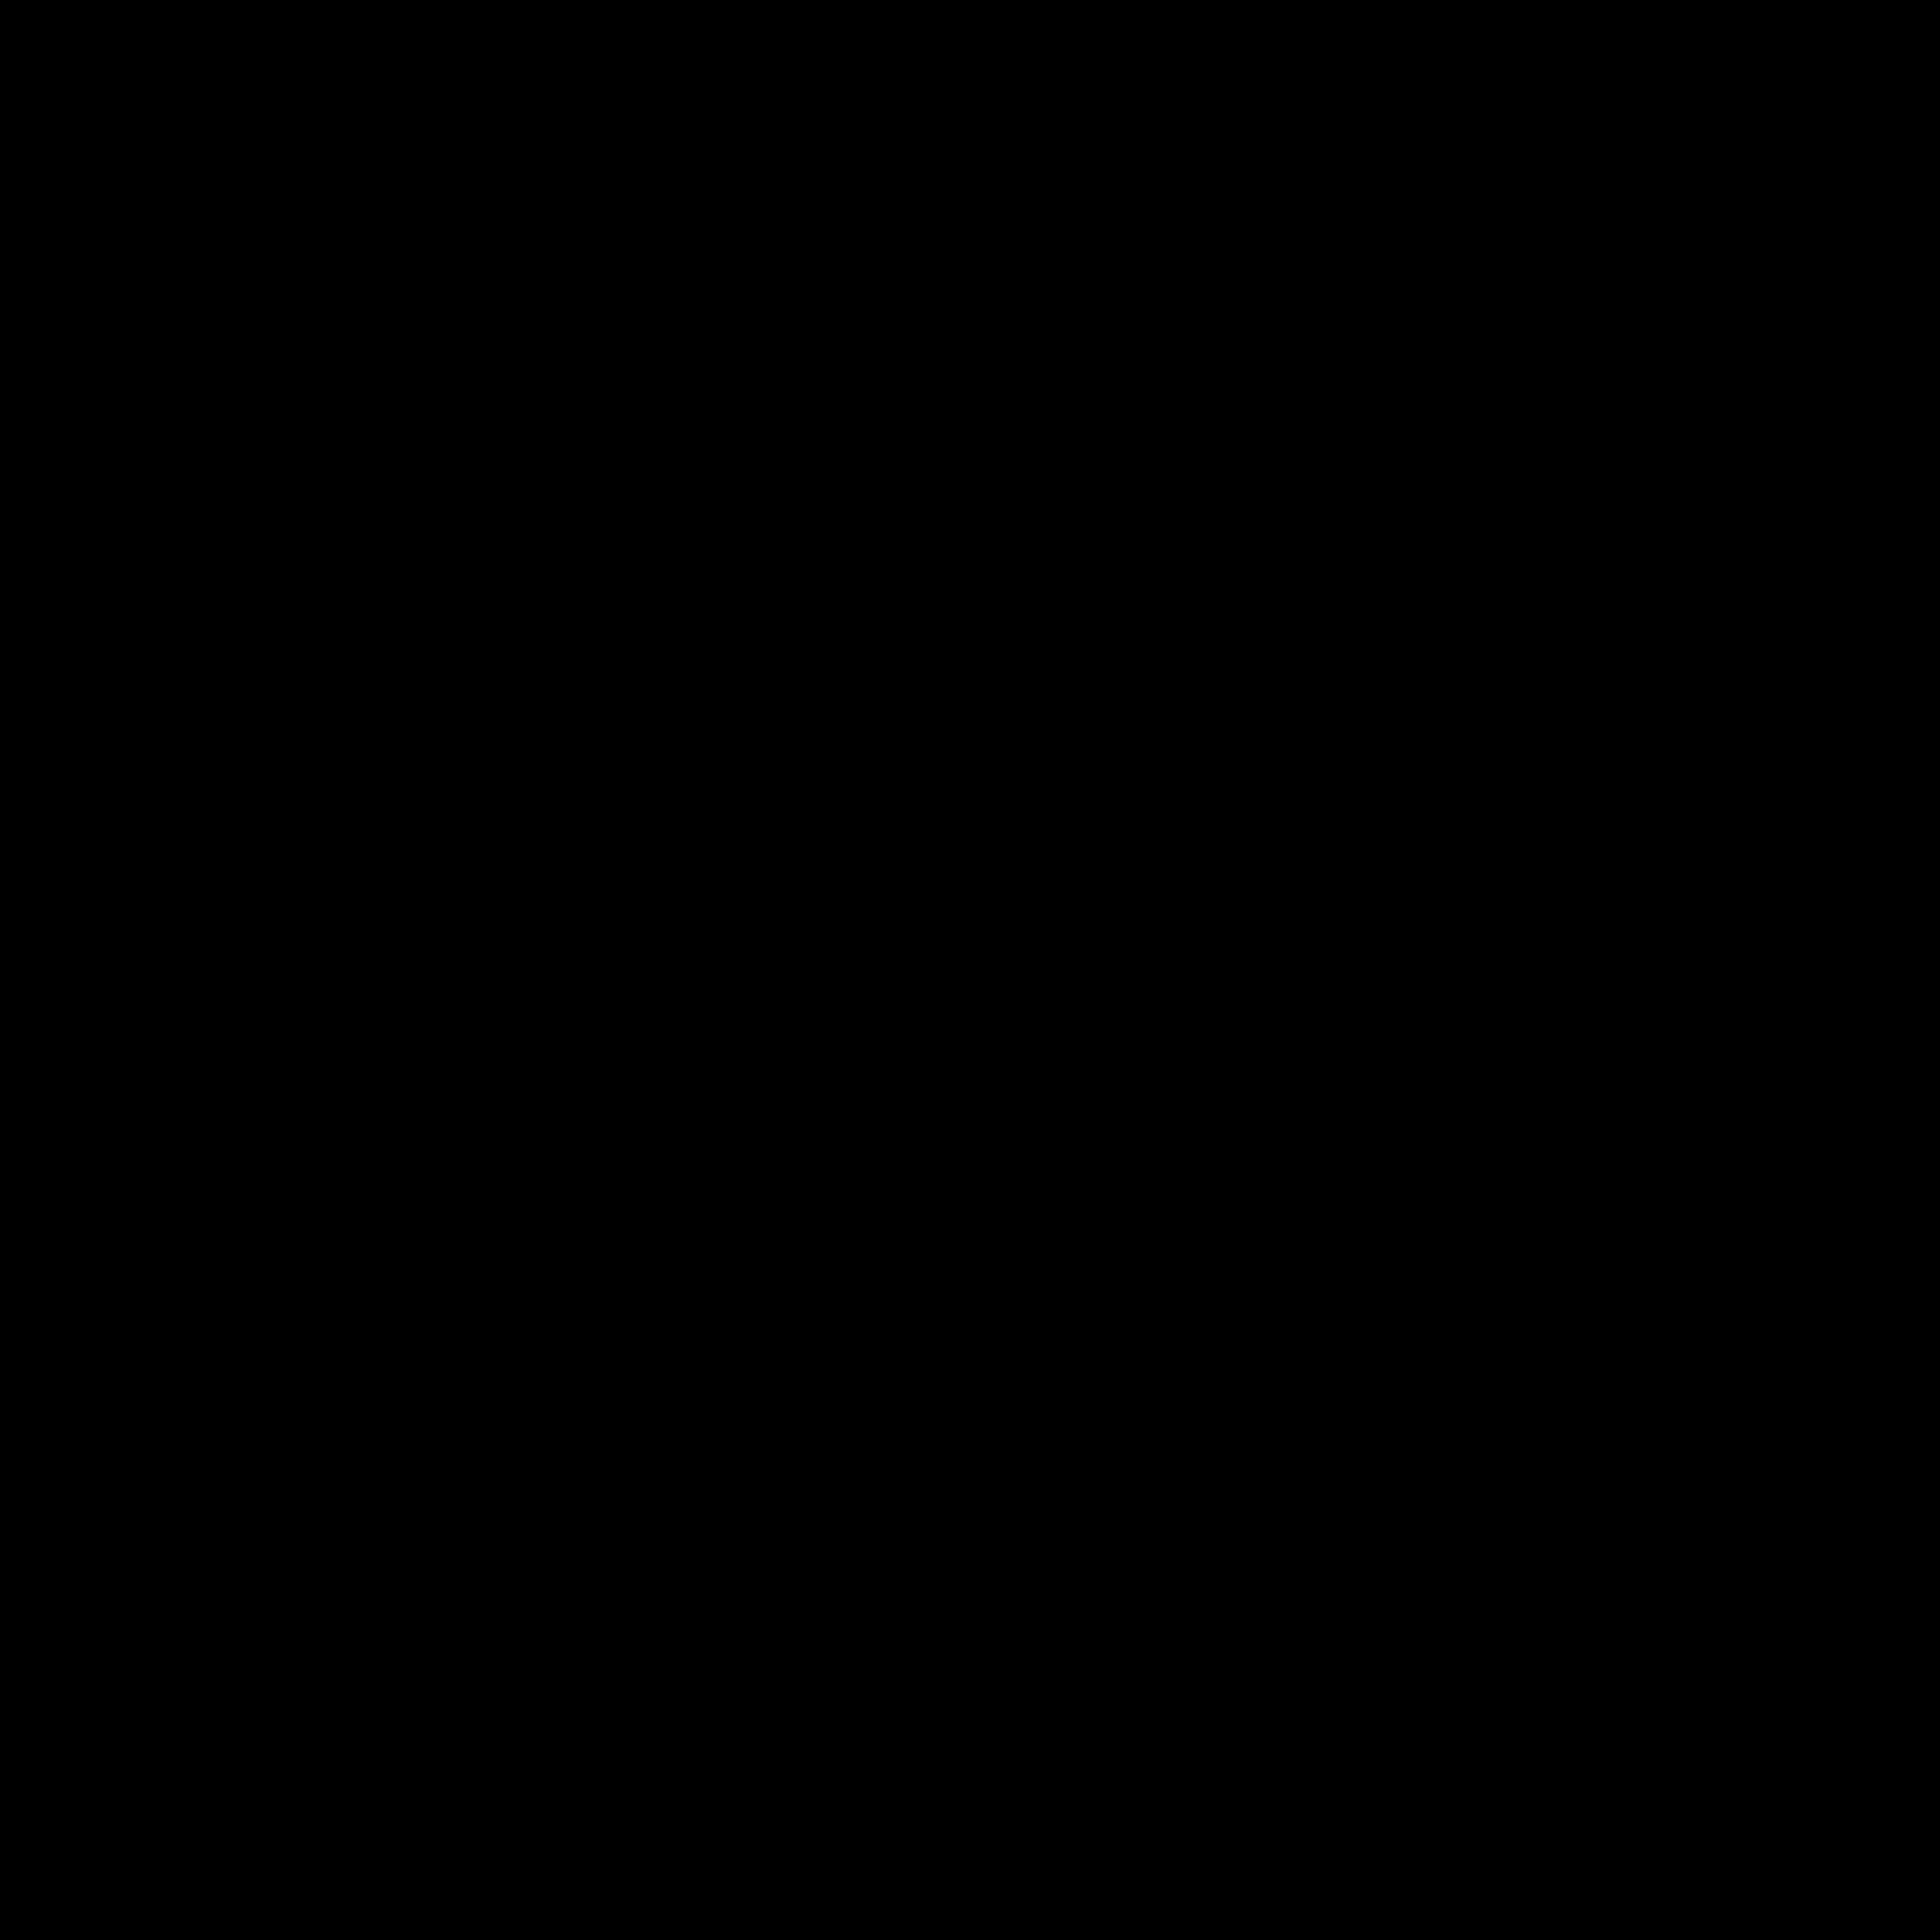 Gears clipart svg. File gear wikimedia commons